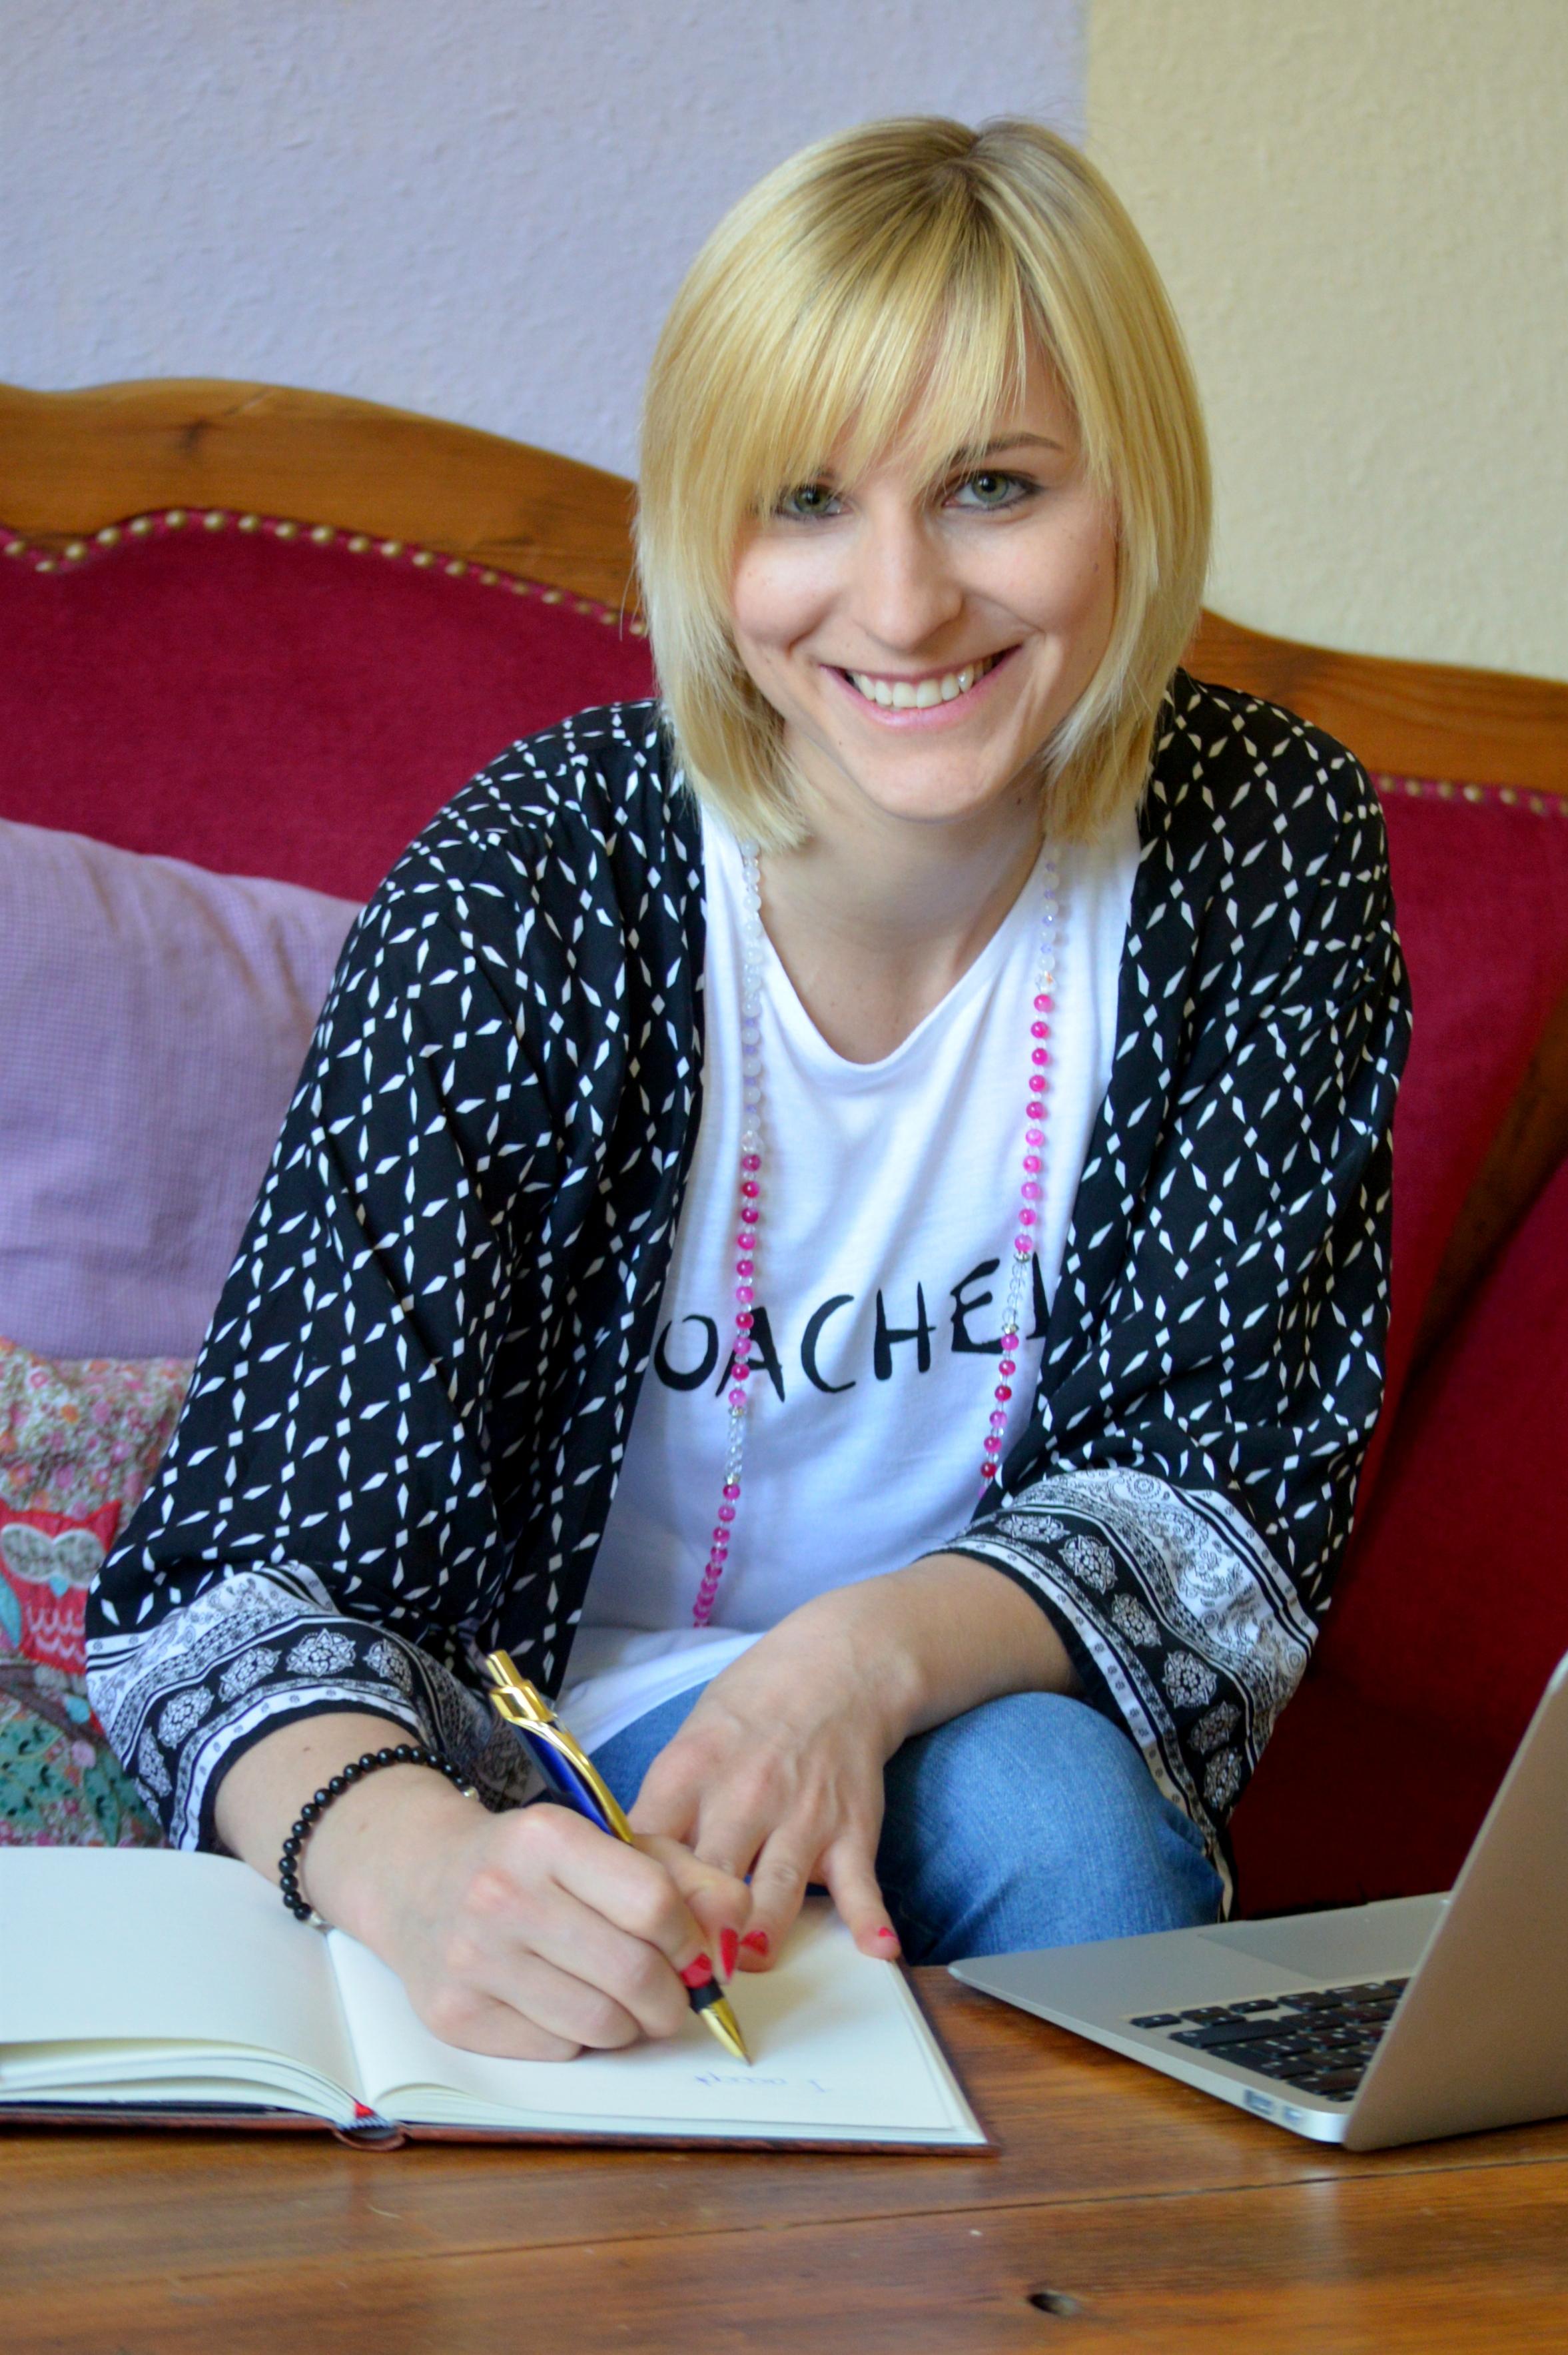 Anne-Sophie: Building Self-Trust